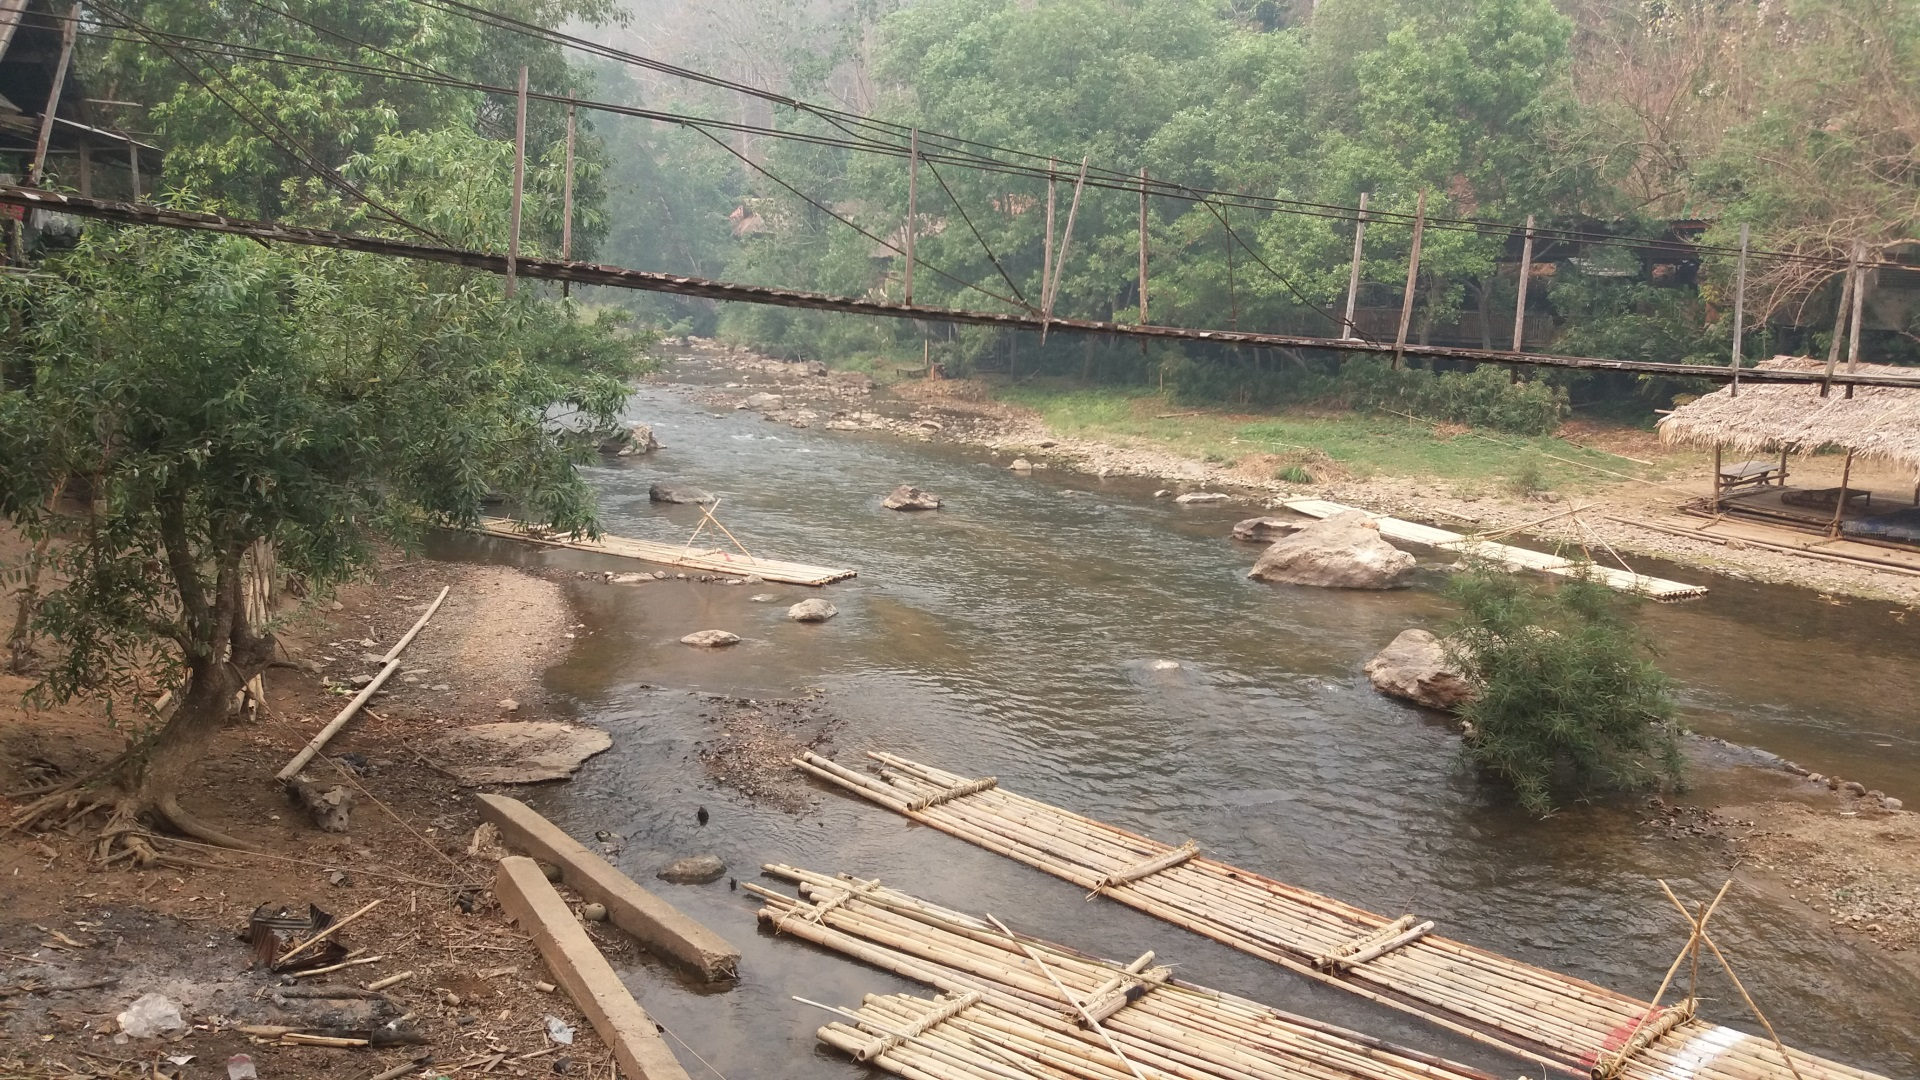 Visiter La rivière Mae Tang en rafting bambou - Thaïlande